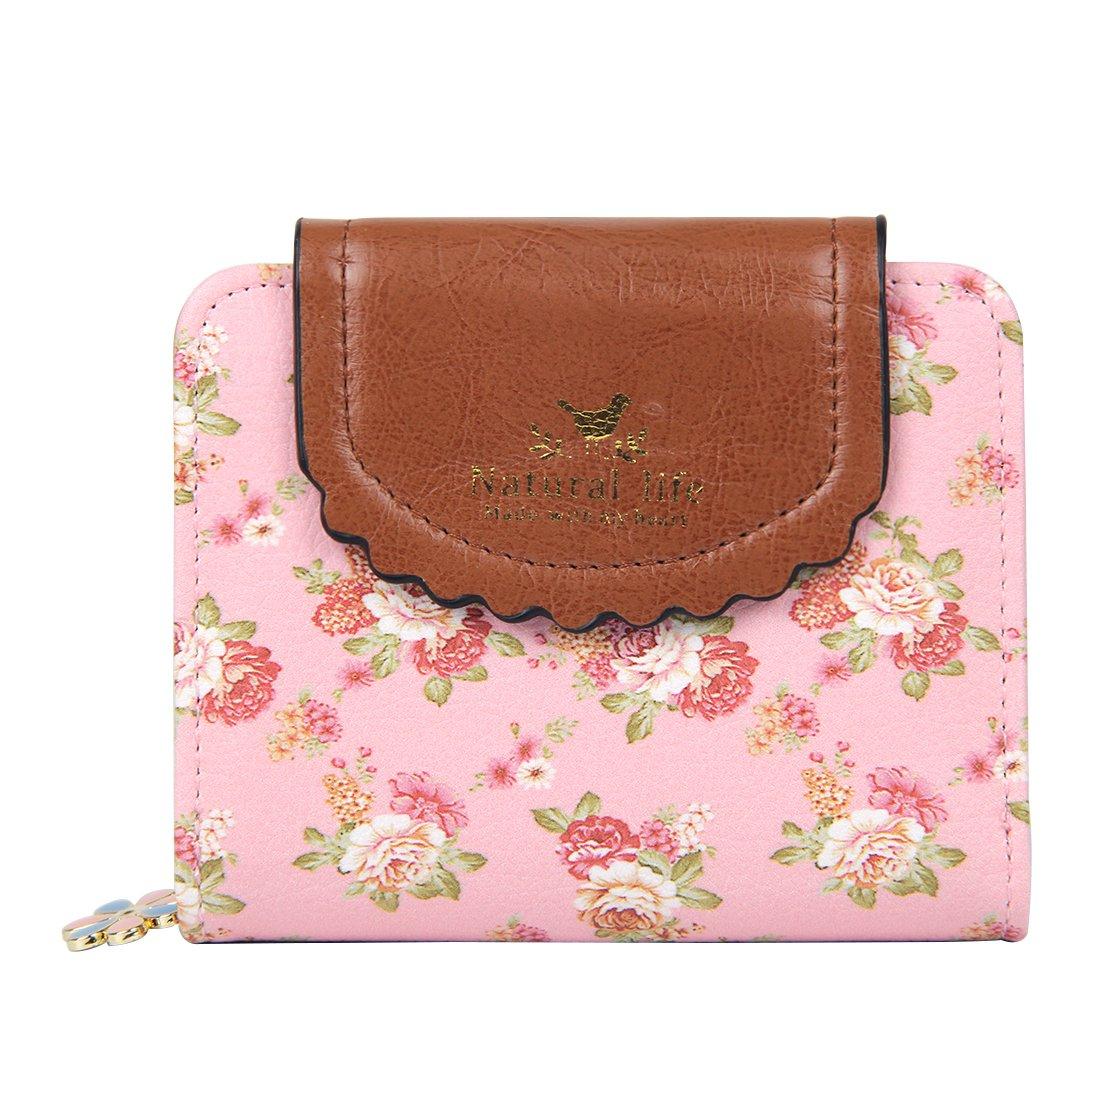 Badiya Women's Vintage Cute Floral Zip Mini Wallet Short Design Coin Purse Dreambox WW02006PP